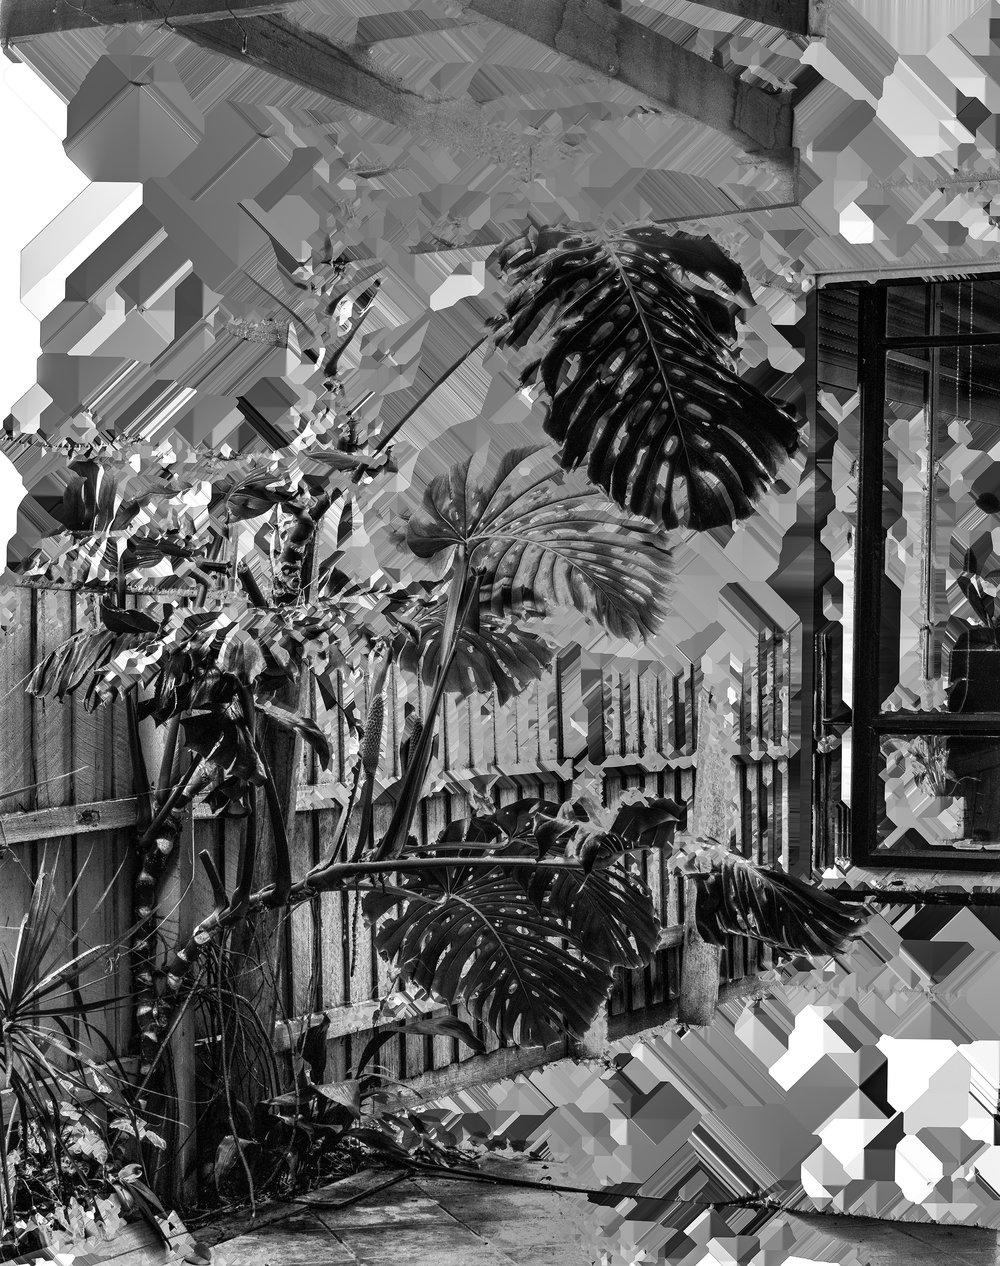 Copy of JoshuaBroadhurst_Untitled_InkjetMetallicPrint_40x50.jpg